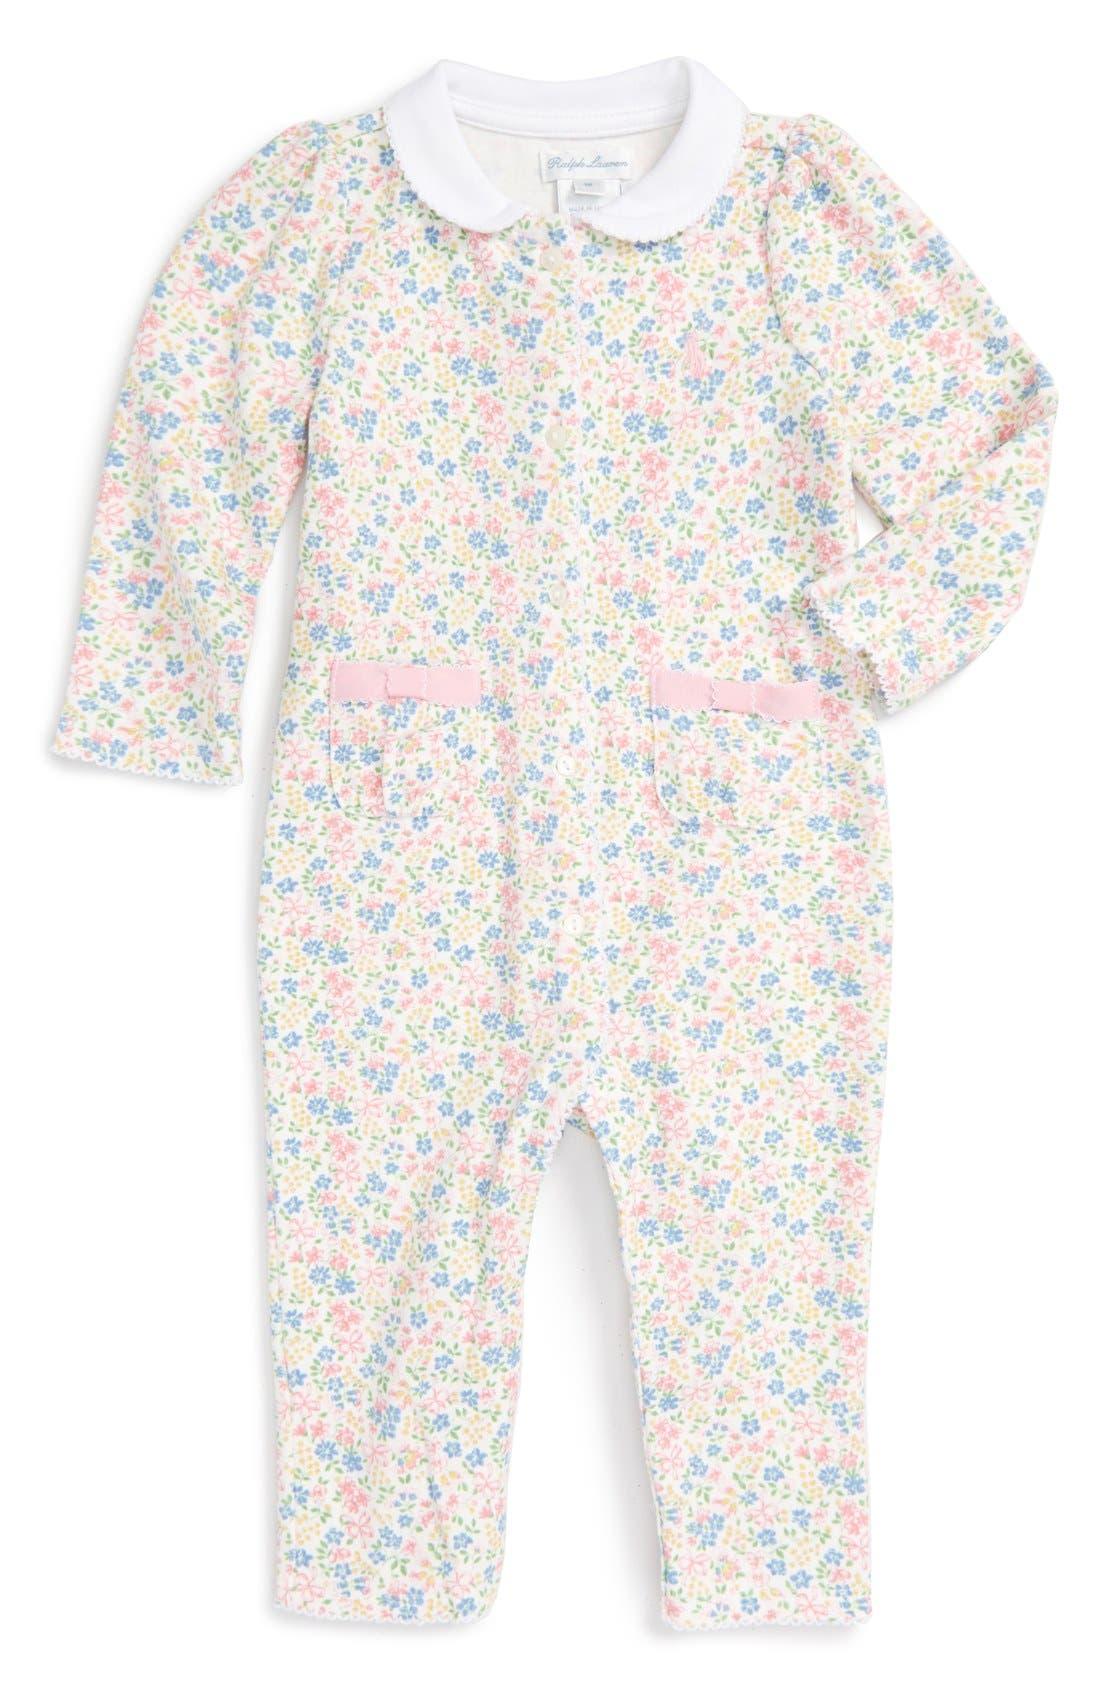 Ralph Lauren Floral Print Romper (Baby Girls)